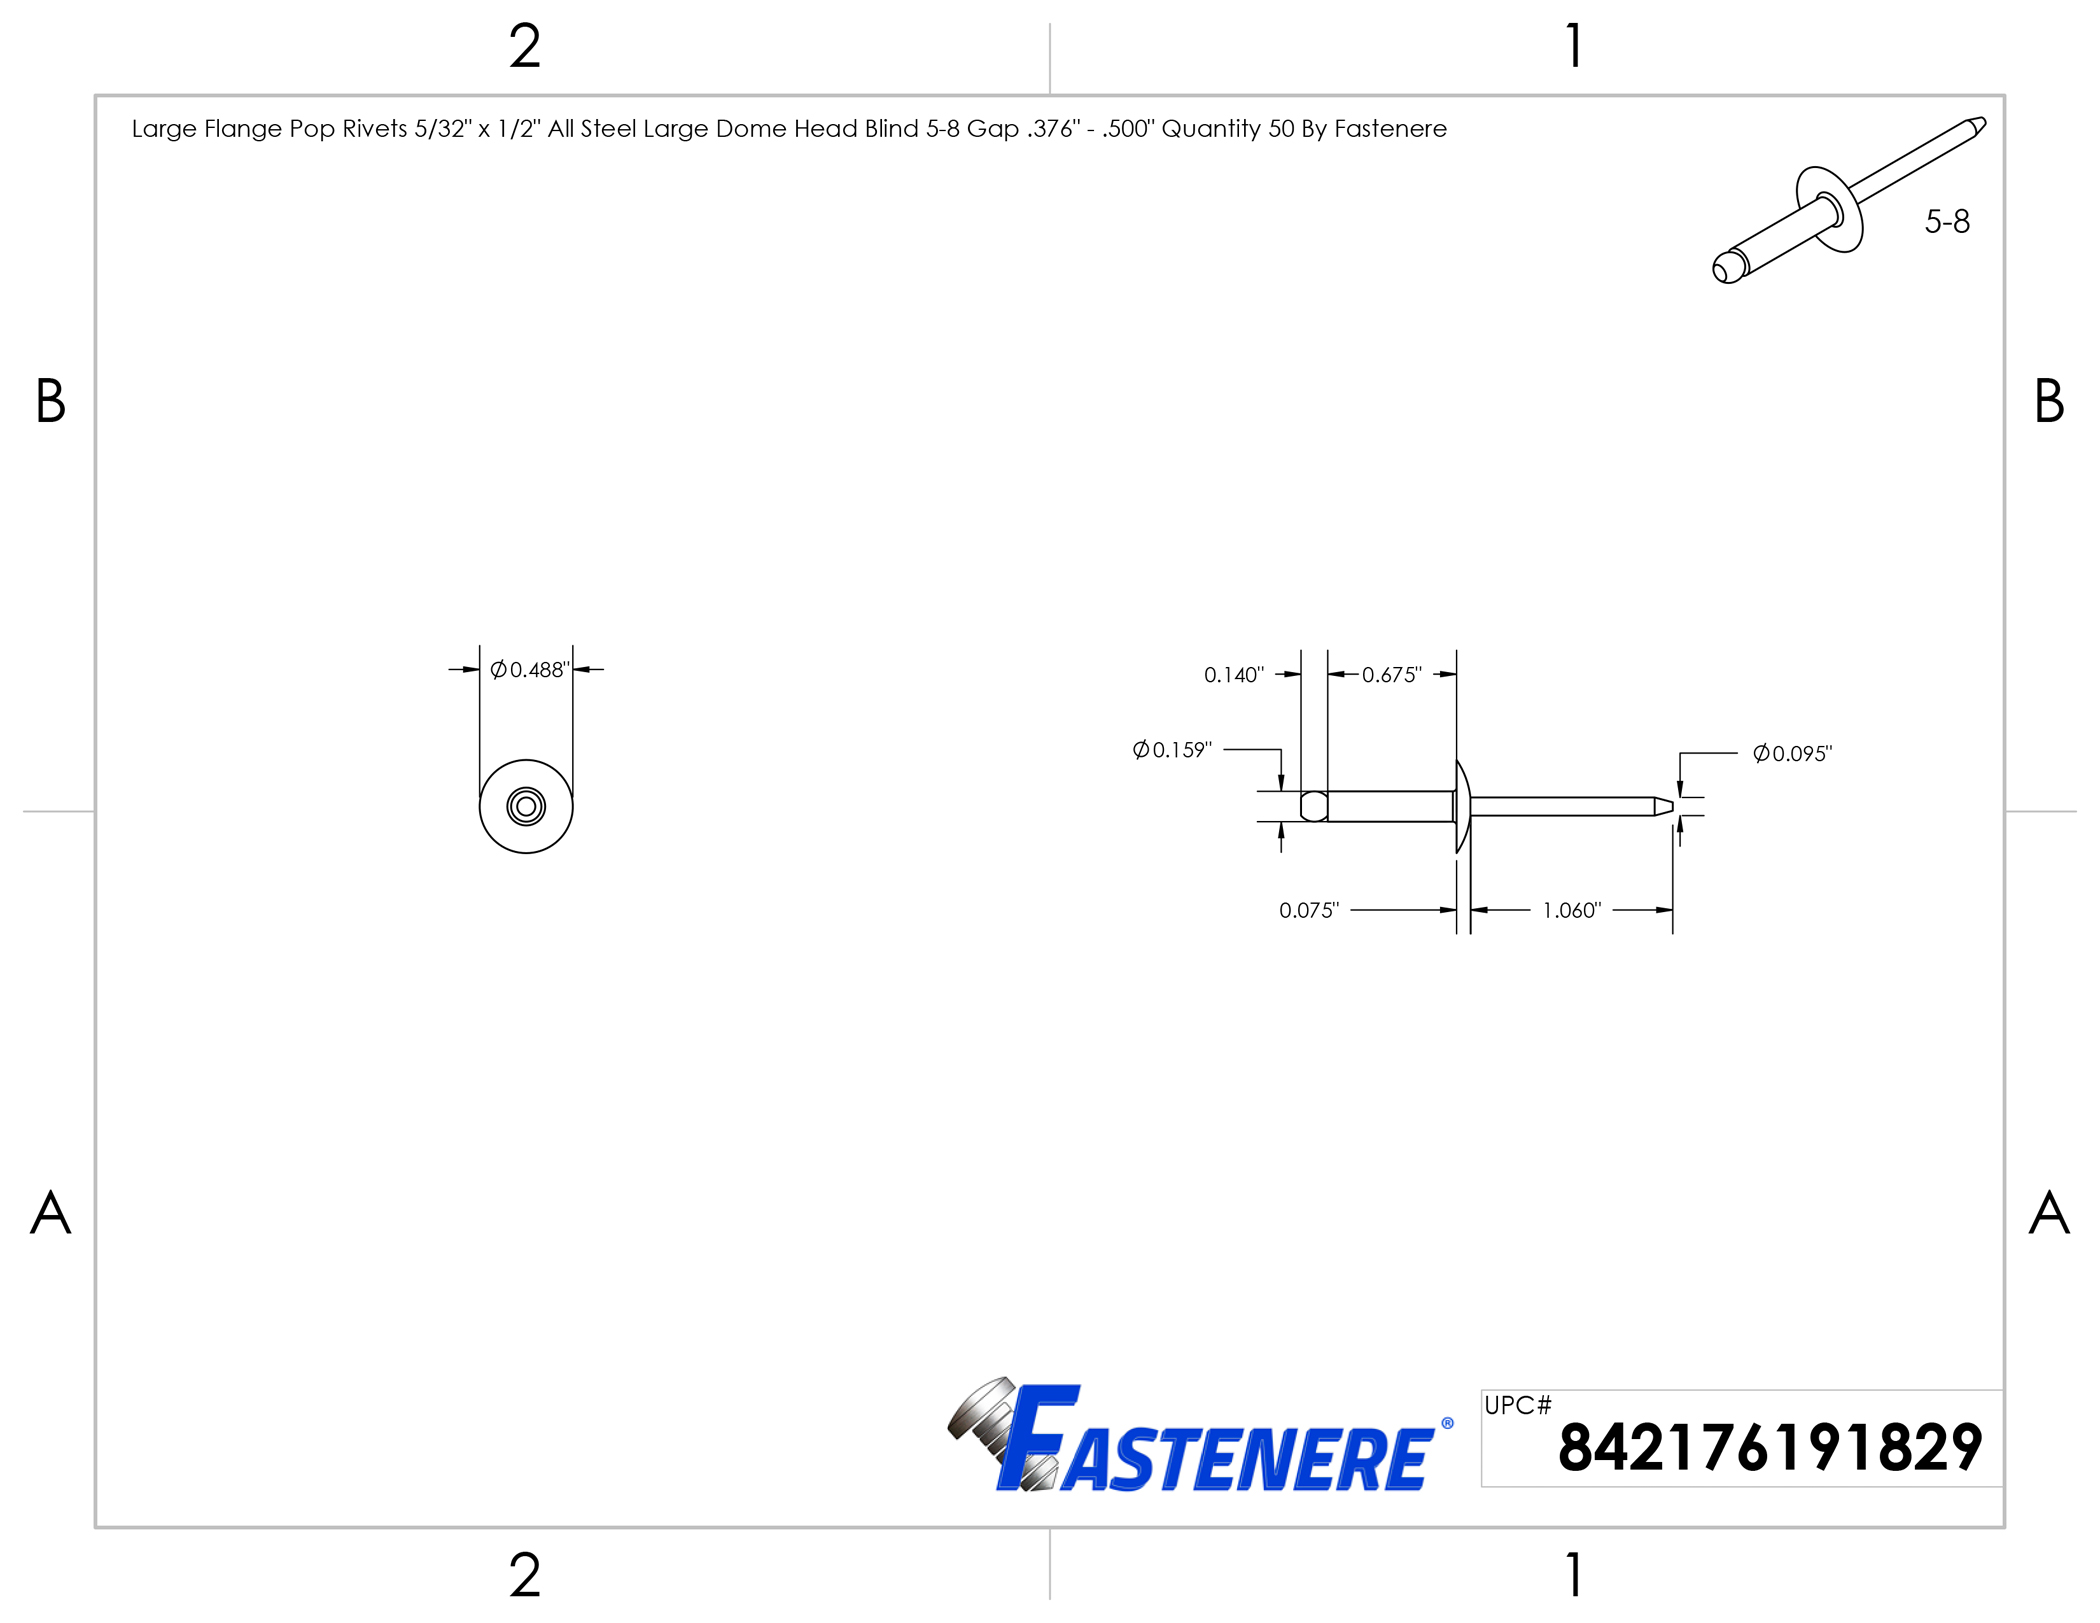 "POP Rivets ALL Stainless Steel 5-8 5//32/"" x 1//2/"" Grip Range QTY 25"